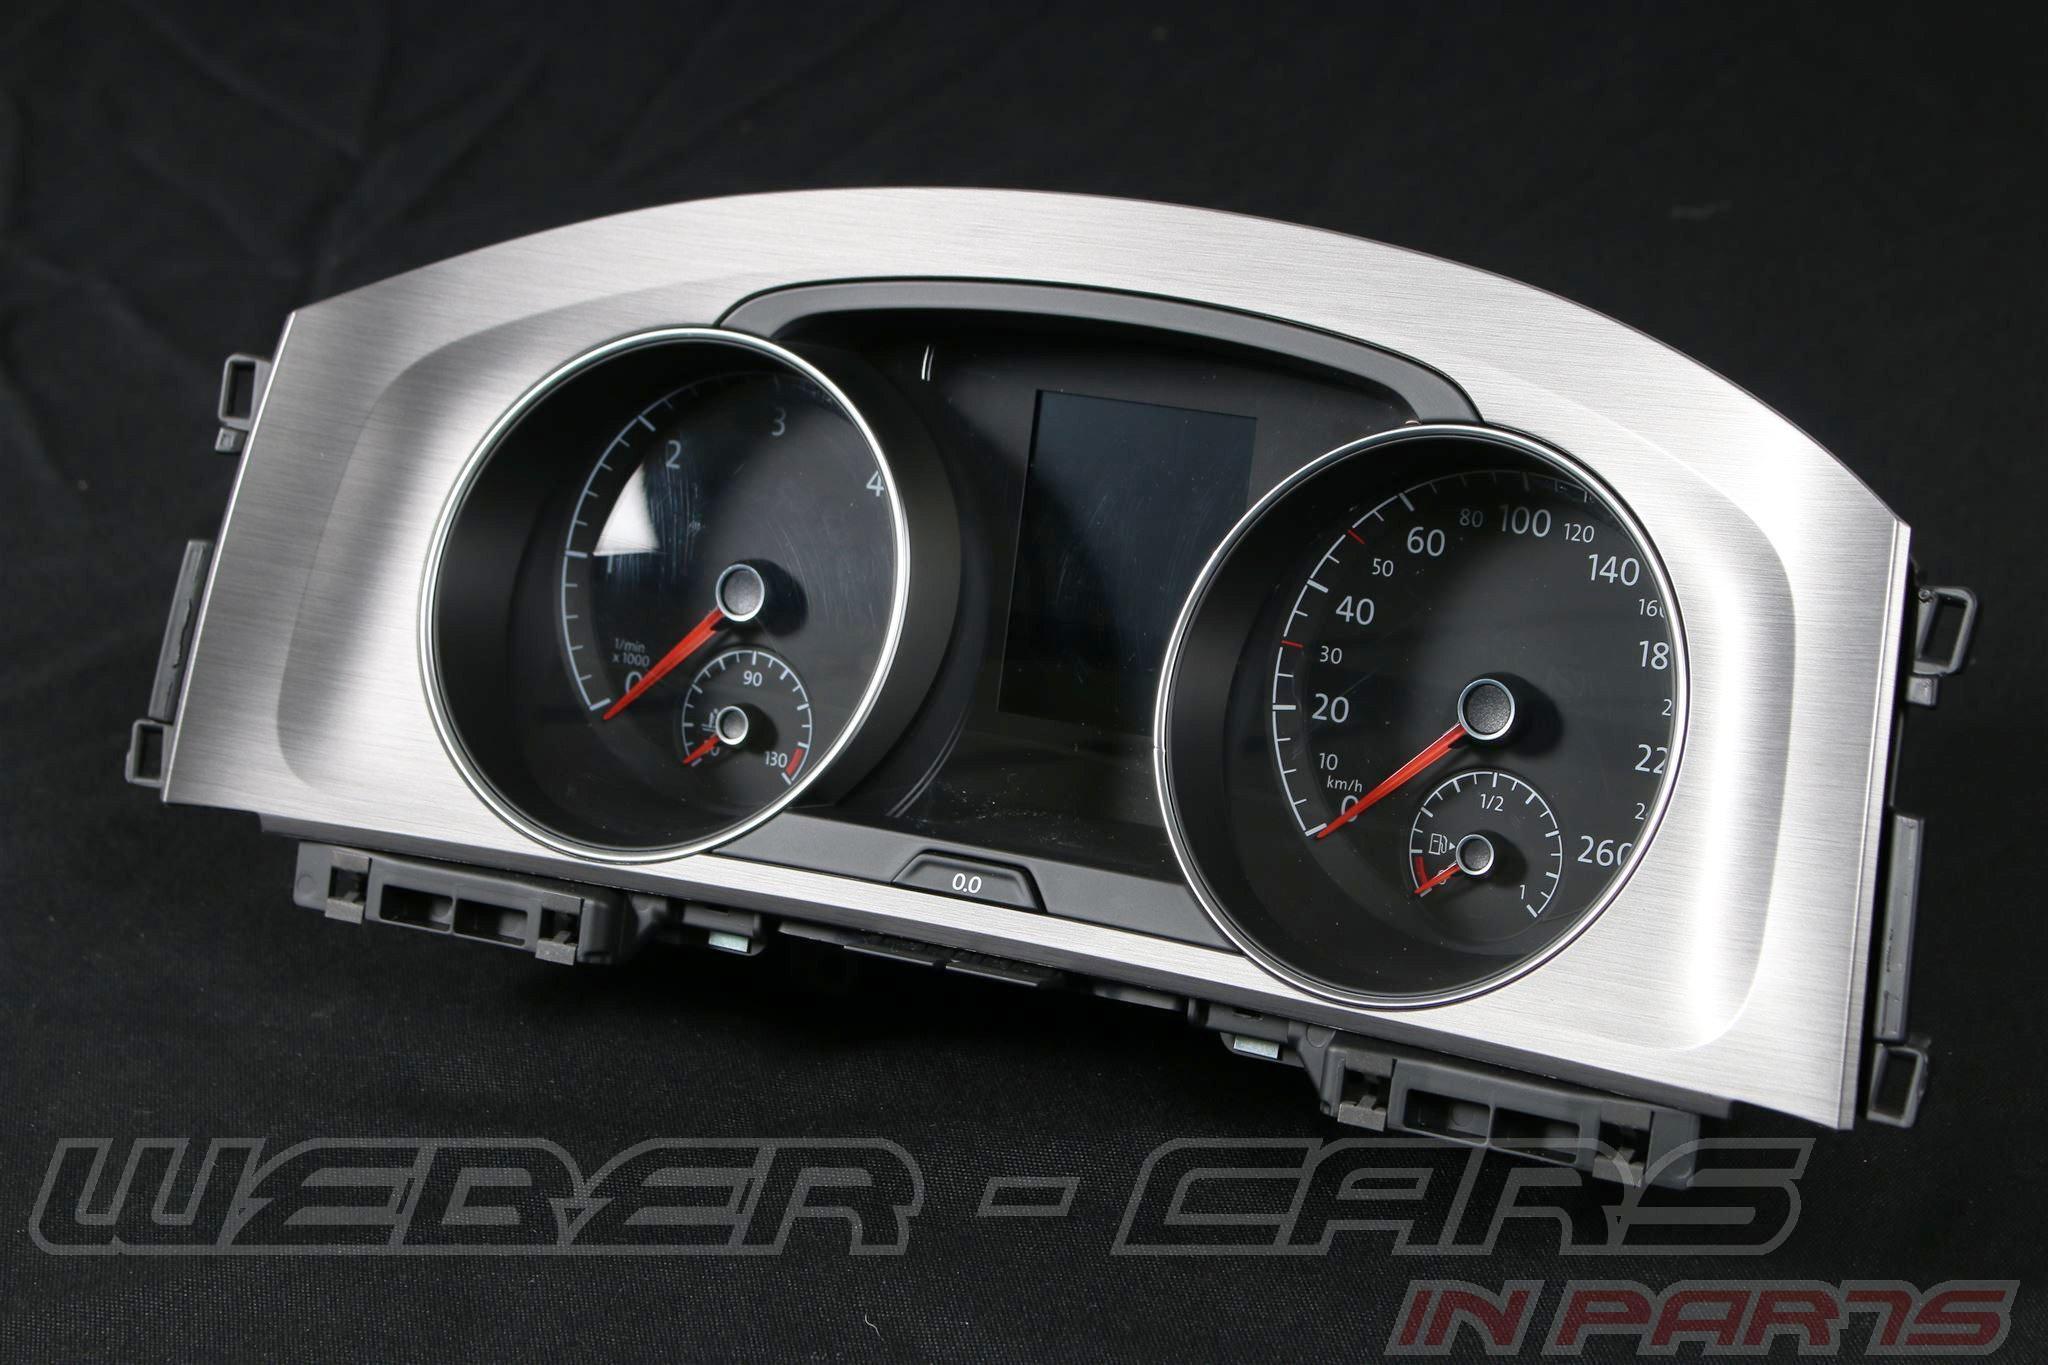 vw golf 7 diesel 260km h tacho kombiinstrument cluster speedo 5g0920860a ebay. Black Bedroom Furniture Sets. Home Design Ideas